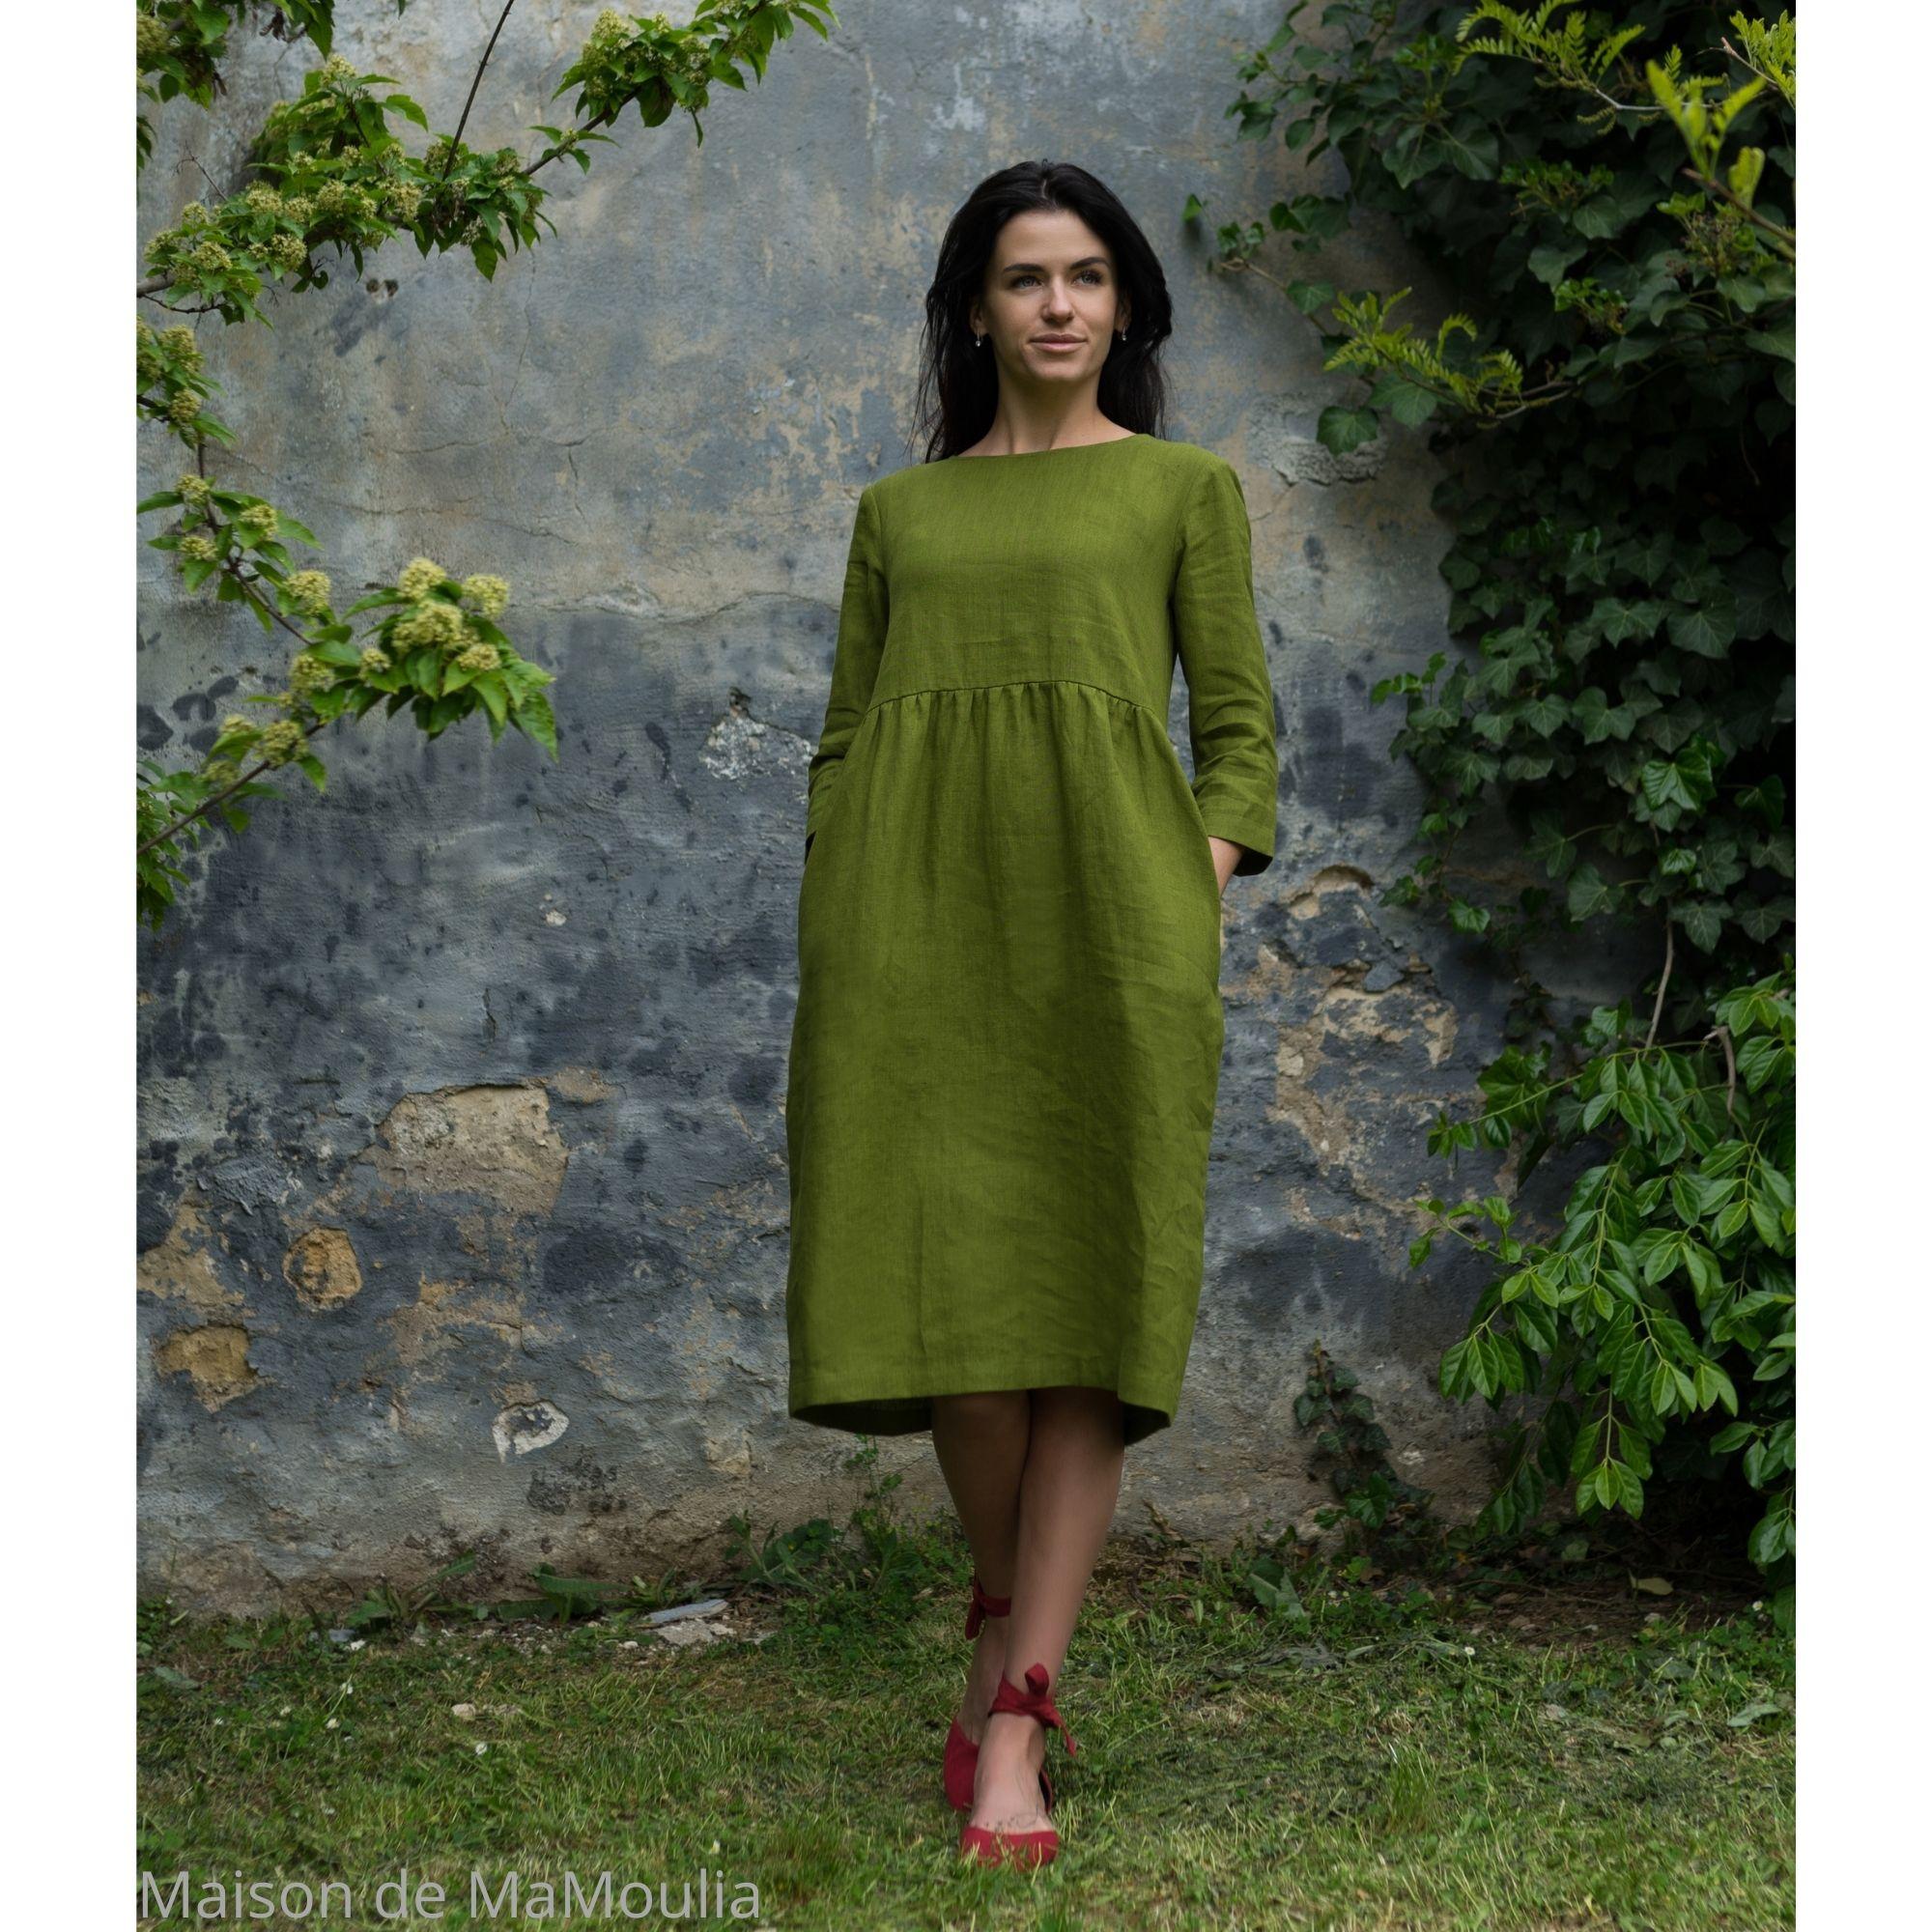 OFFON - Robe ample midi - 100% lin lavé - Vert mousse